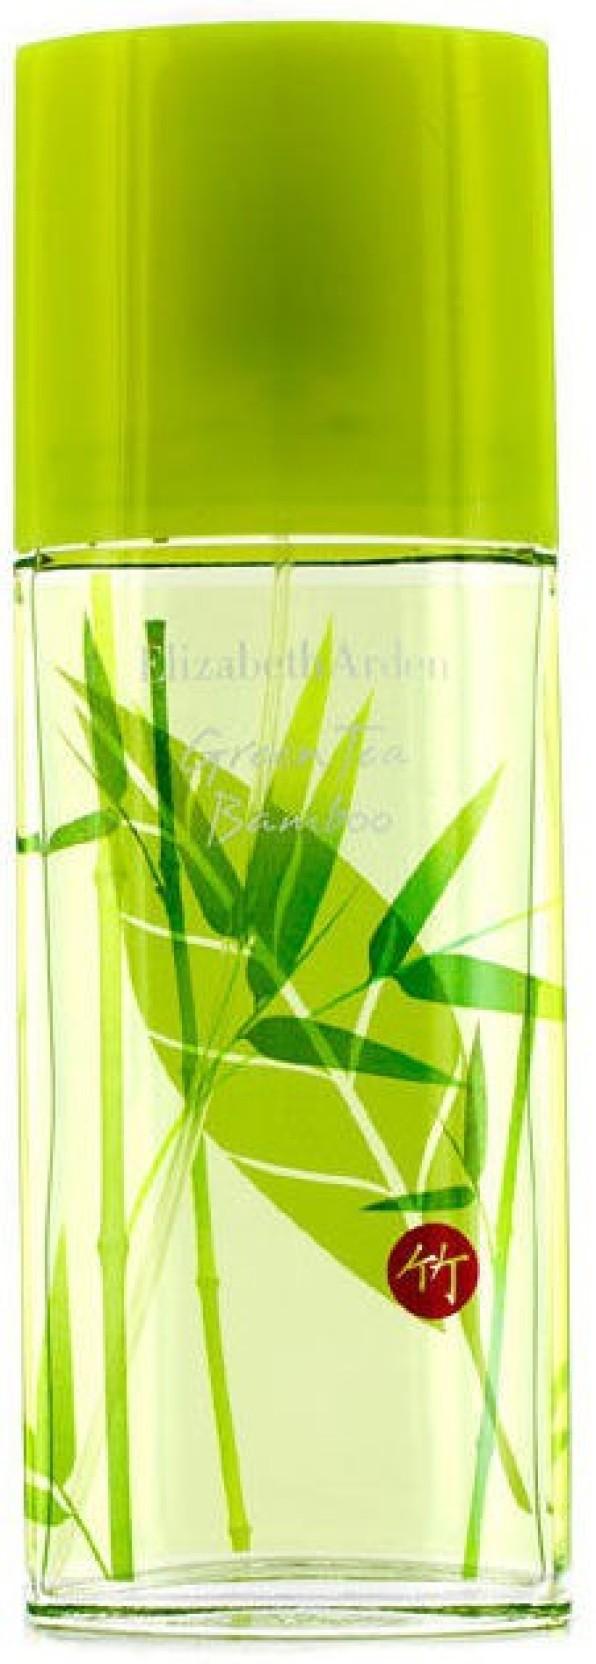 Elizabeth Arden Green Tea Bamboo Eau De Toilette Spray Eau de Toilette - 100 ml. Home